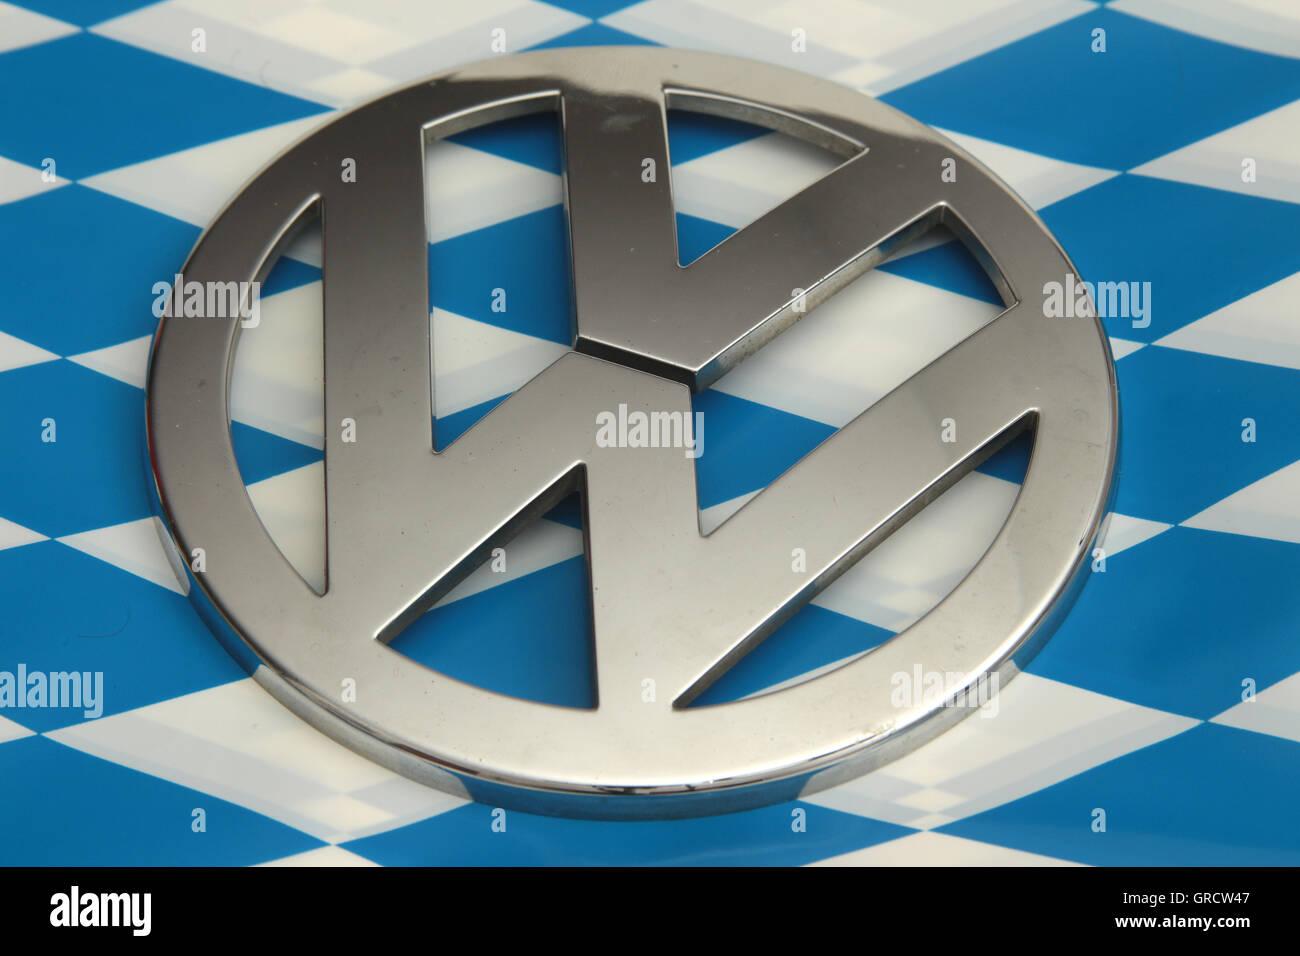 Vw Emblem On Bavarian Flag - Stock Image